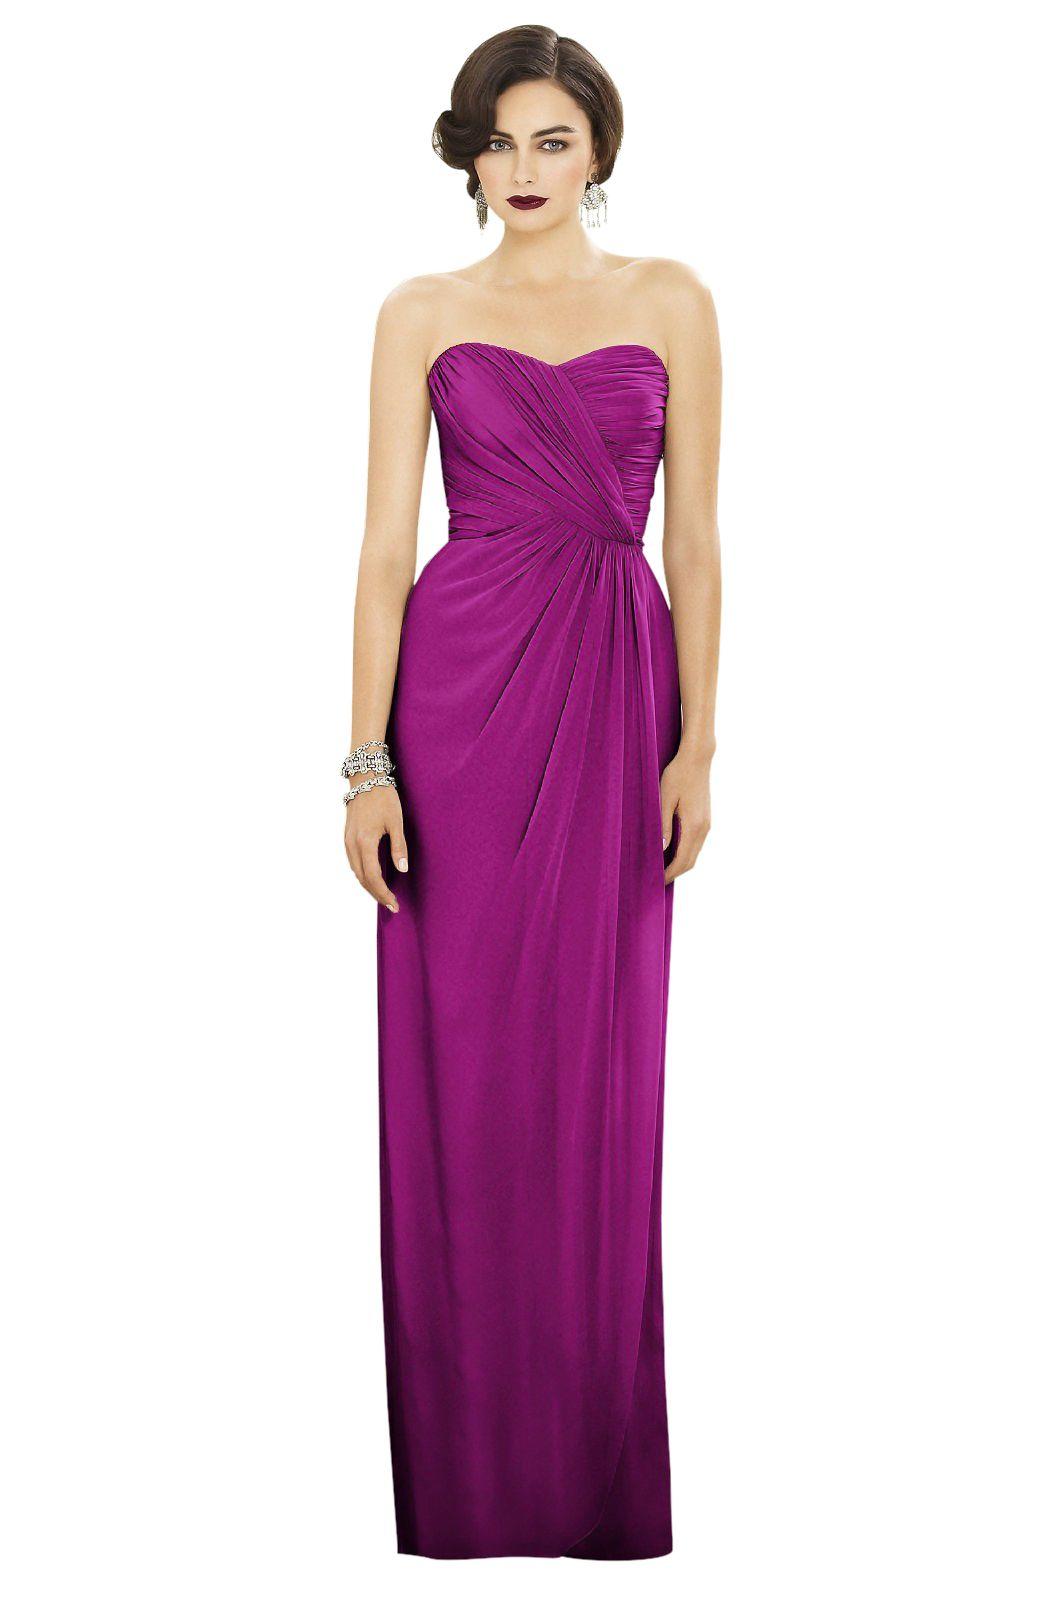 Dessy 2882 Bridesmaid Dress | Weddington Way | Wedding | Pinterest ...